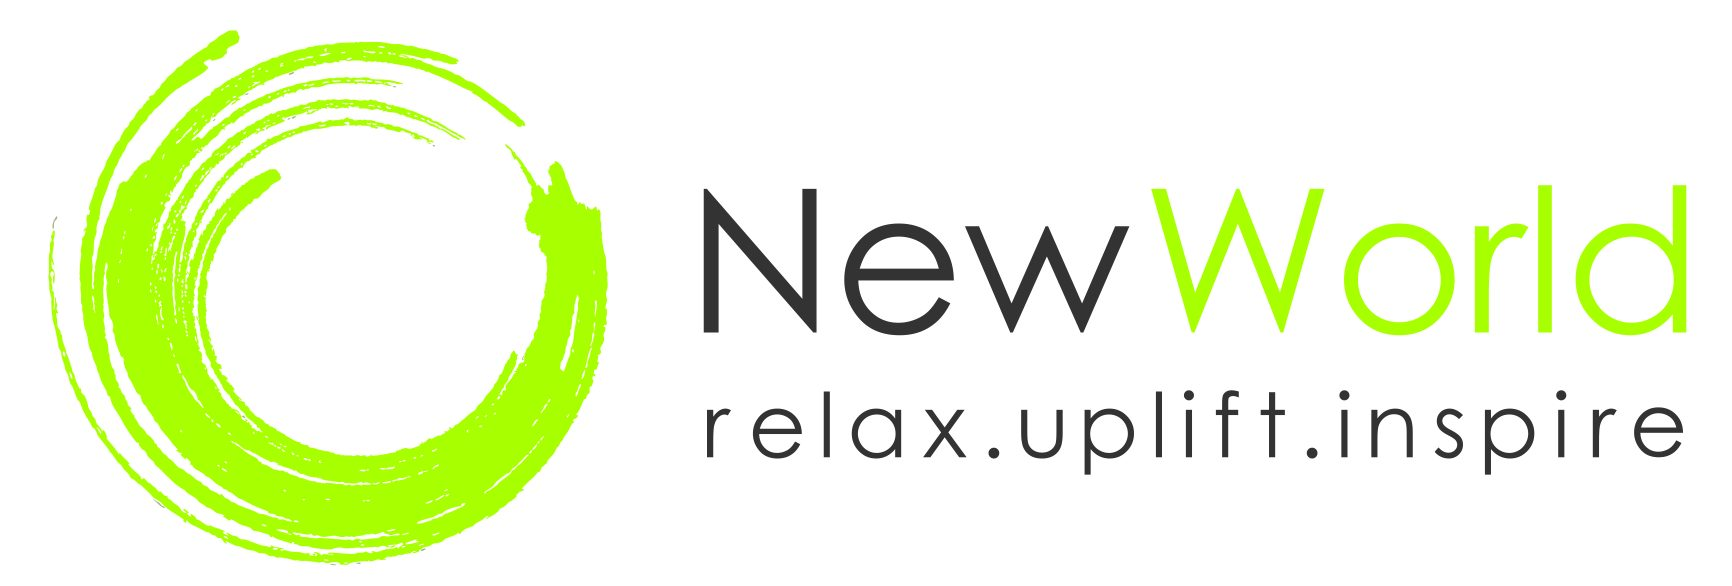 New World Music - New Age Music, Meditation Music, Reiki